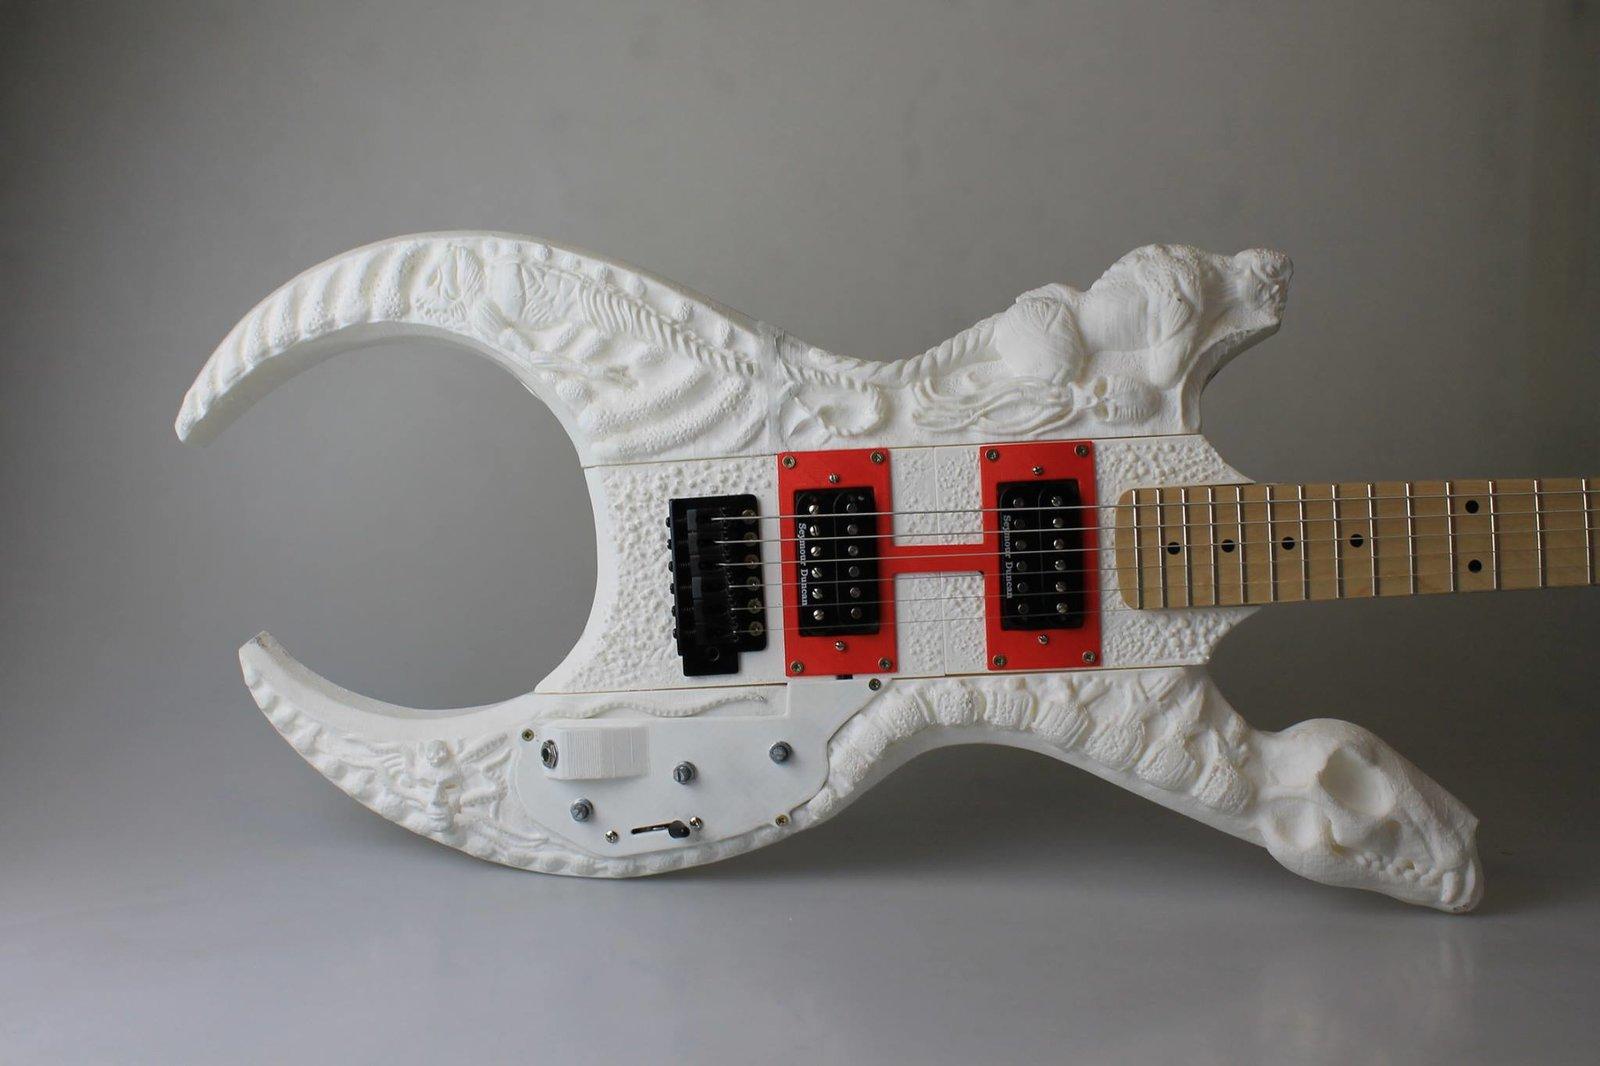 3D printed guitar concept